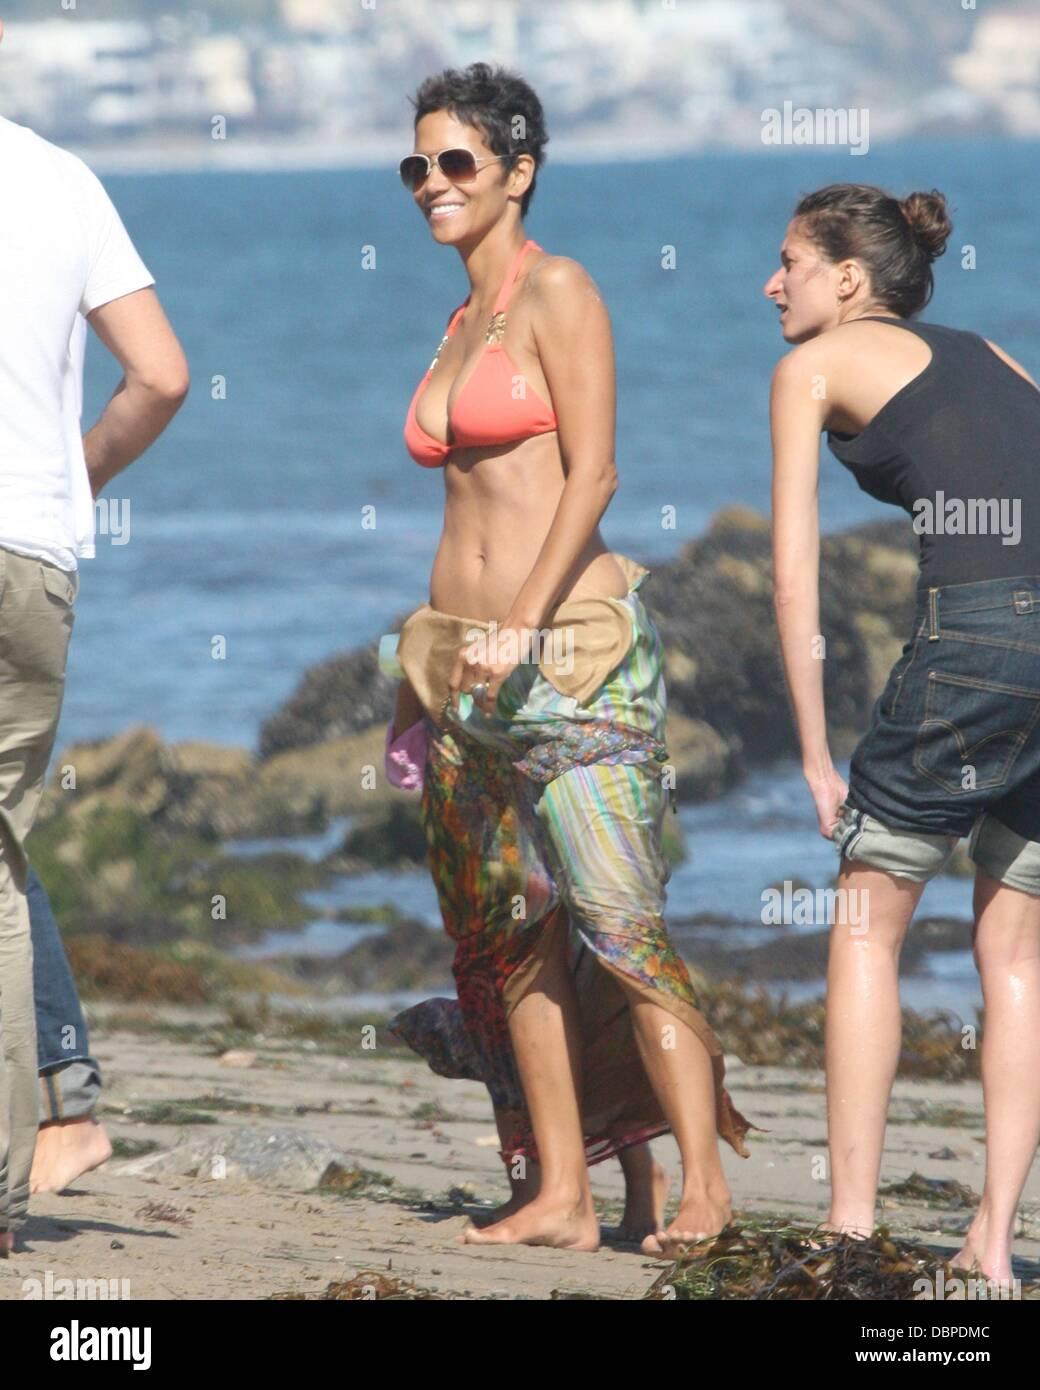 Halle Berry Bikini Stock Photos & Halle Berry Bikini Stock